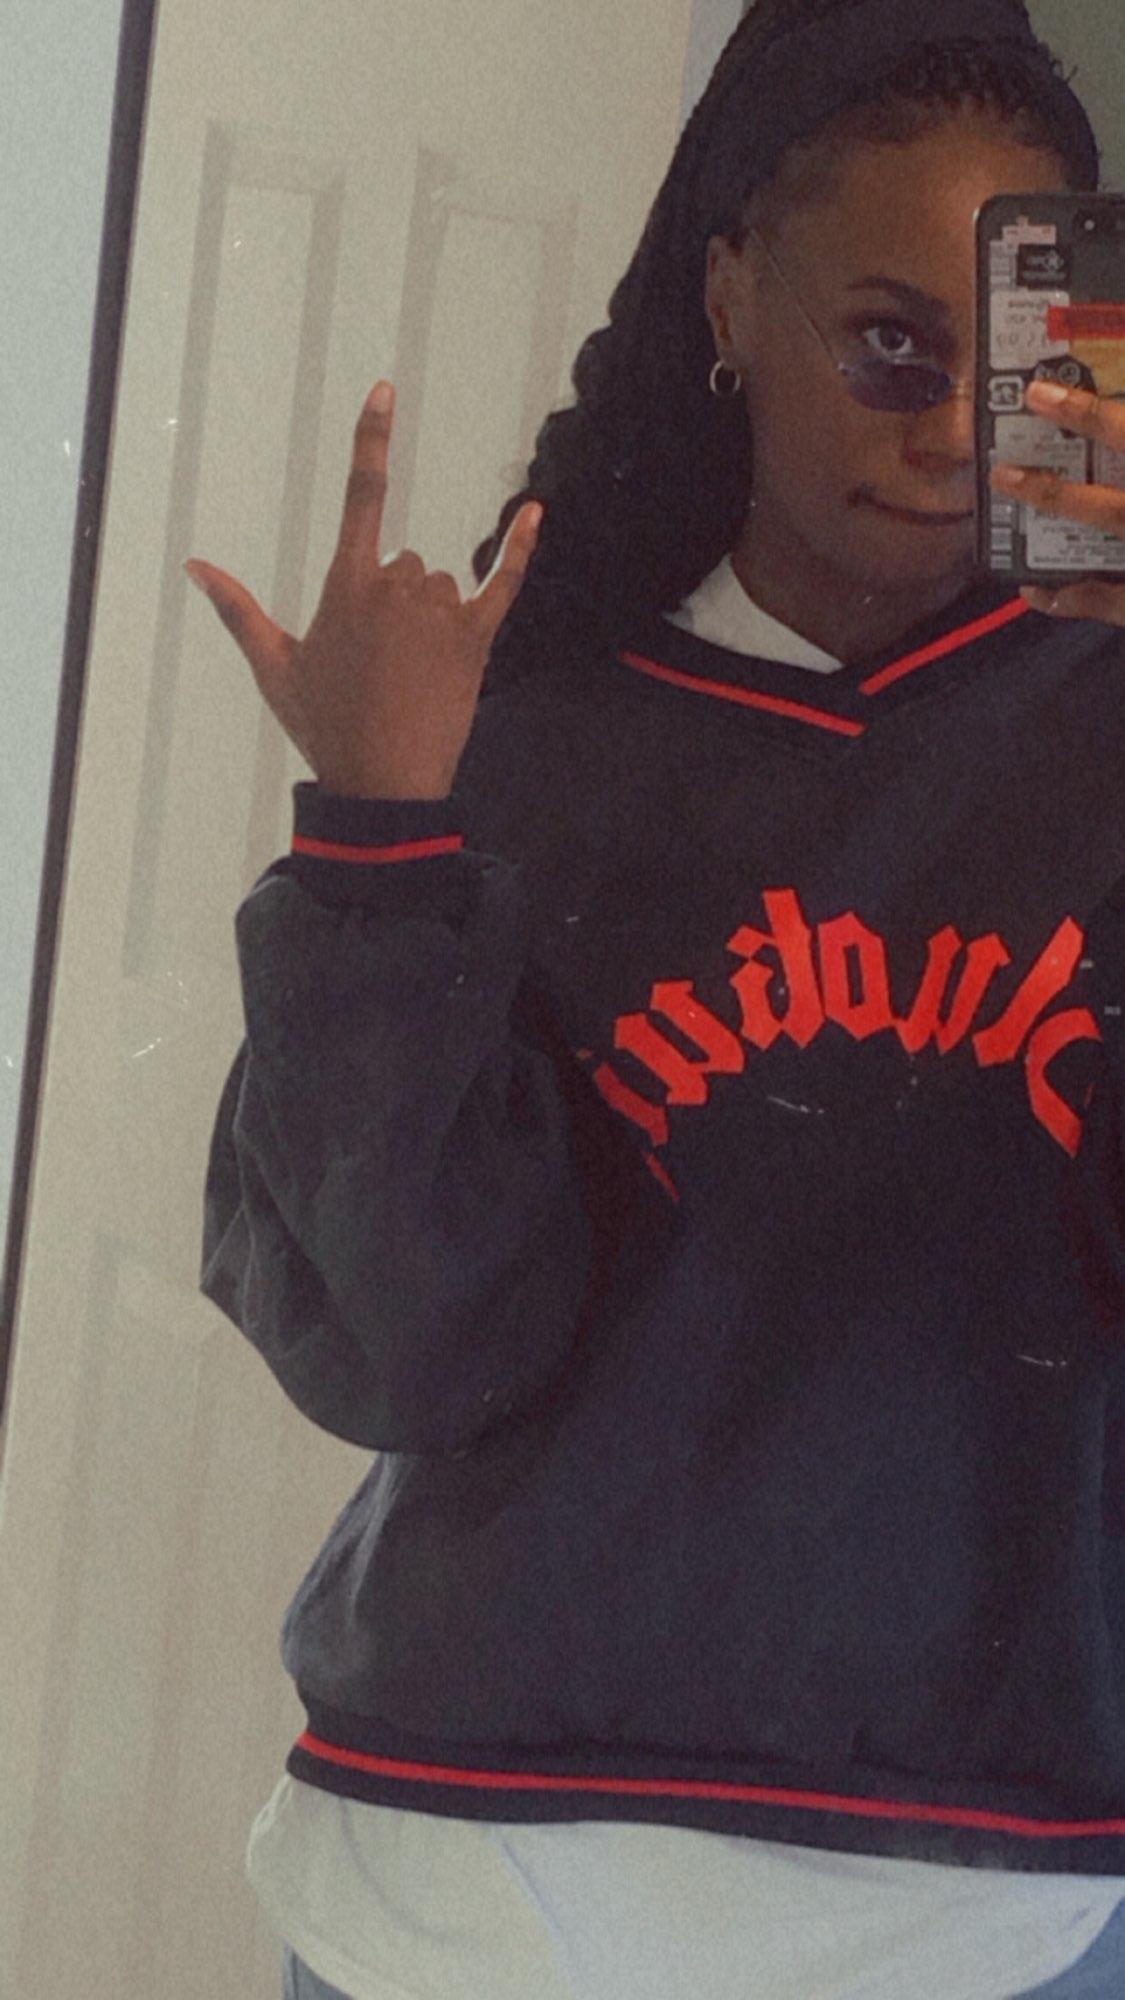 E-boy E-girl Punk Gothic Harajuku V-neck sweatshirt photo review